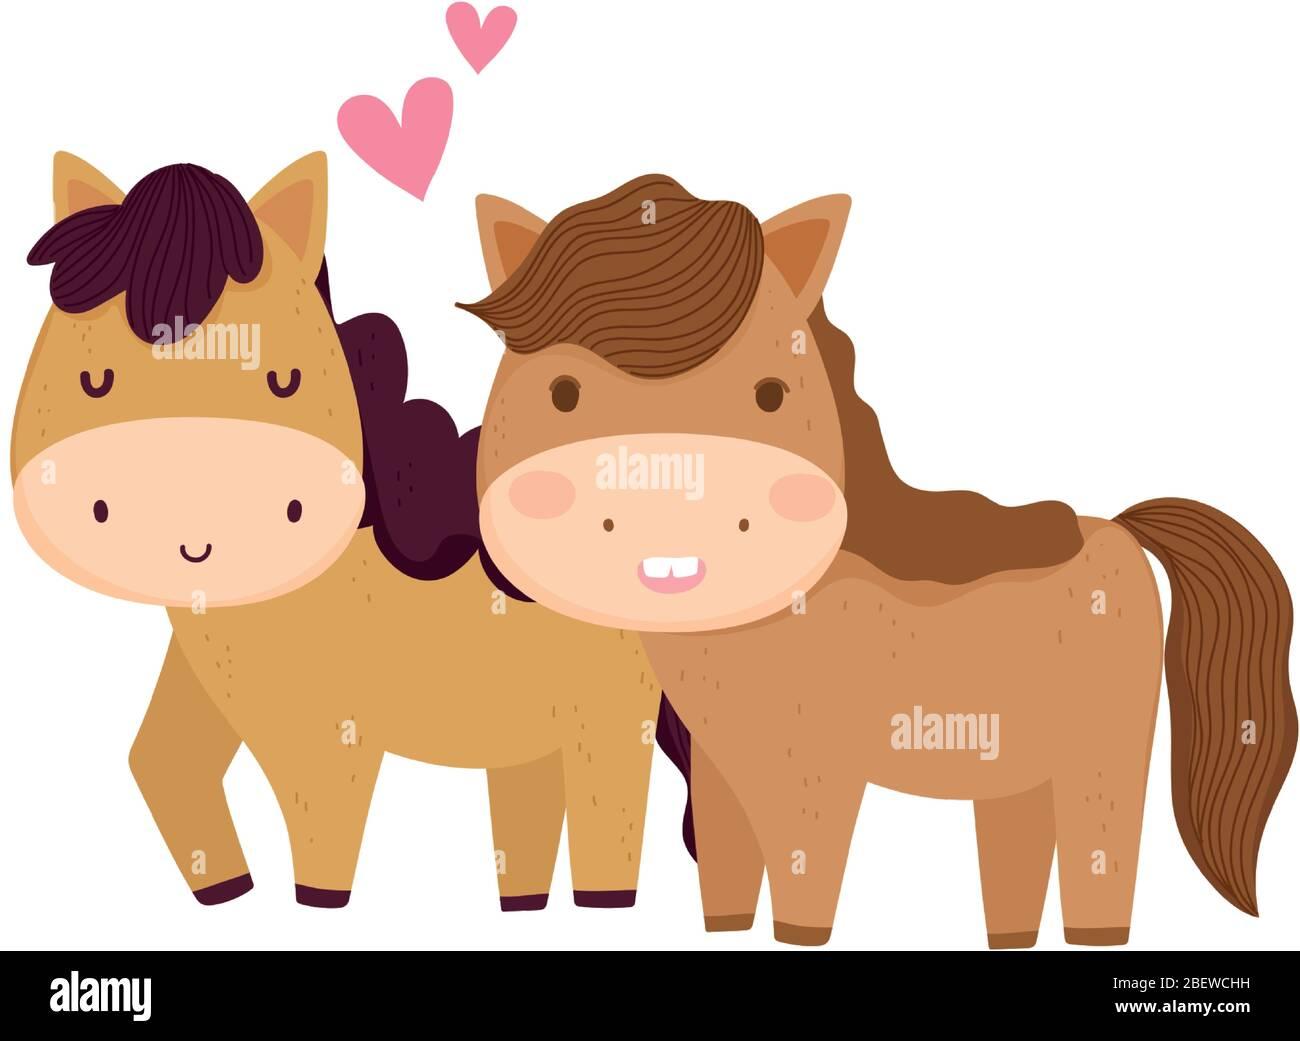 Farm Animals Couple Horses Isolated Icon On White Background Vector Illustration Stock Vector Image Art Alamy